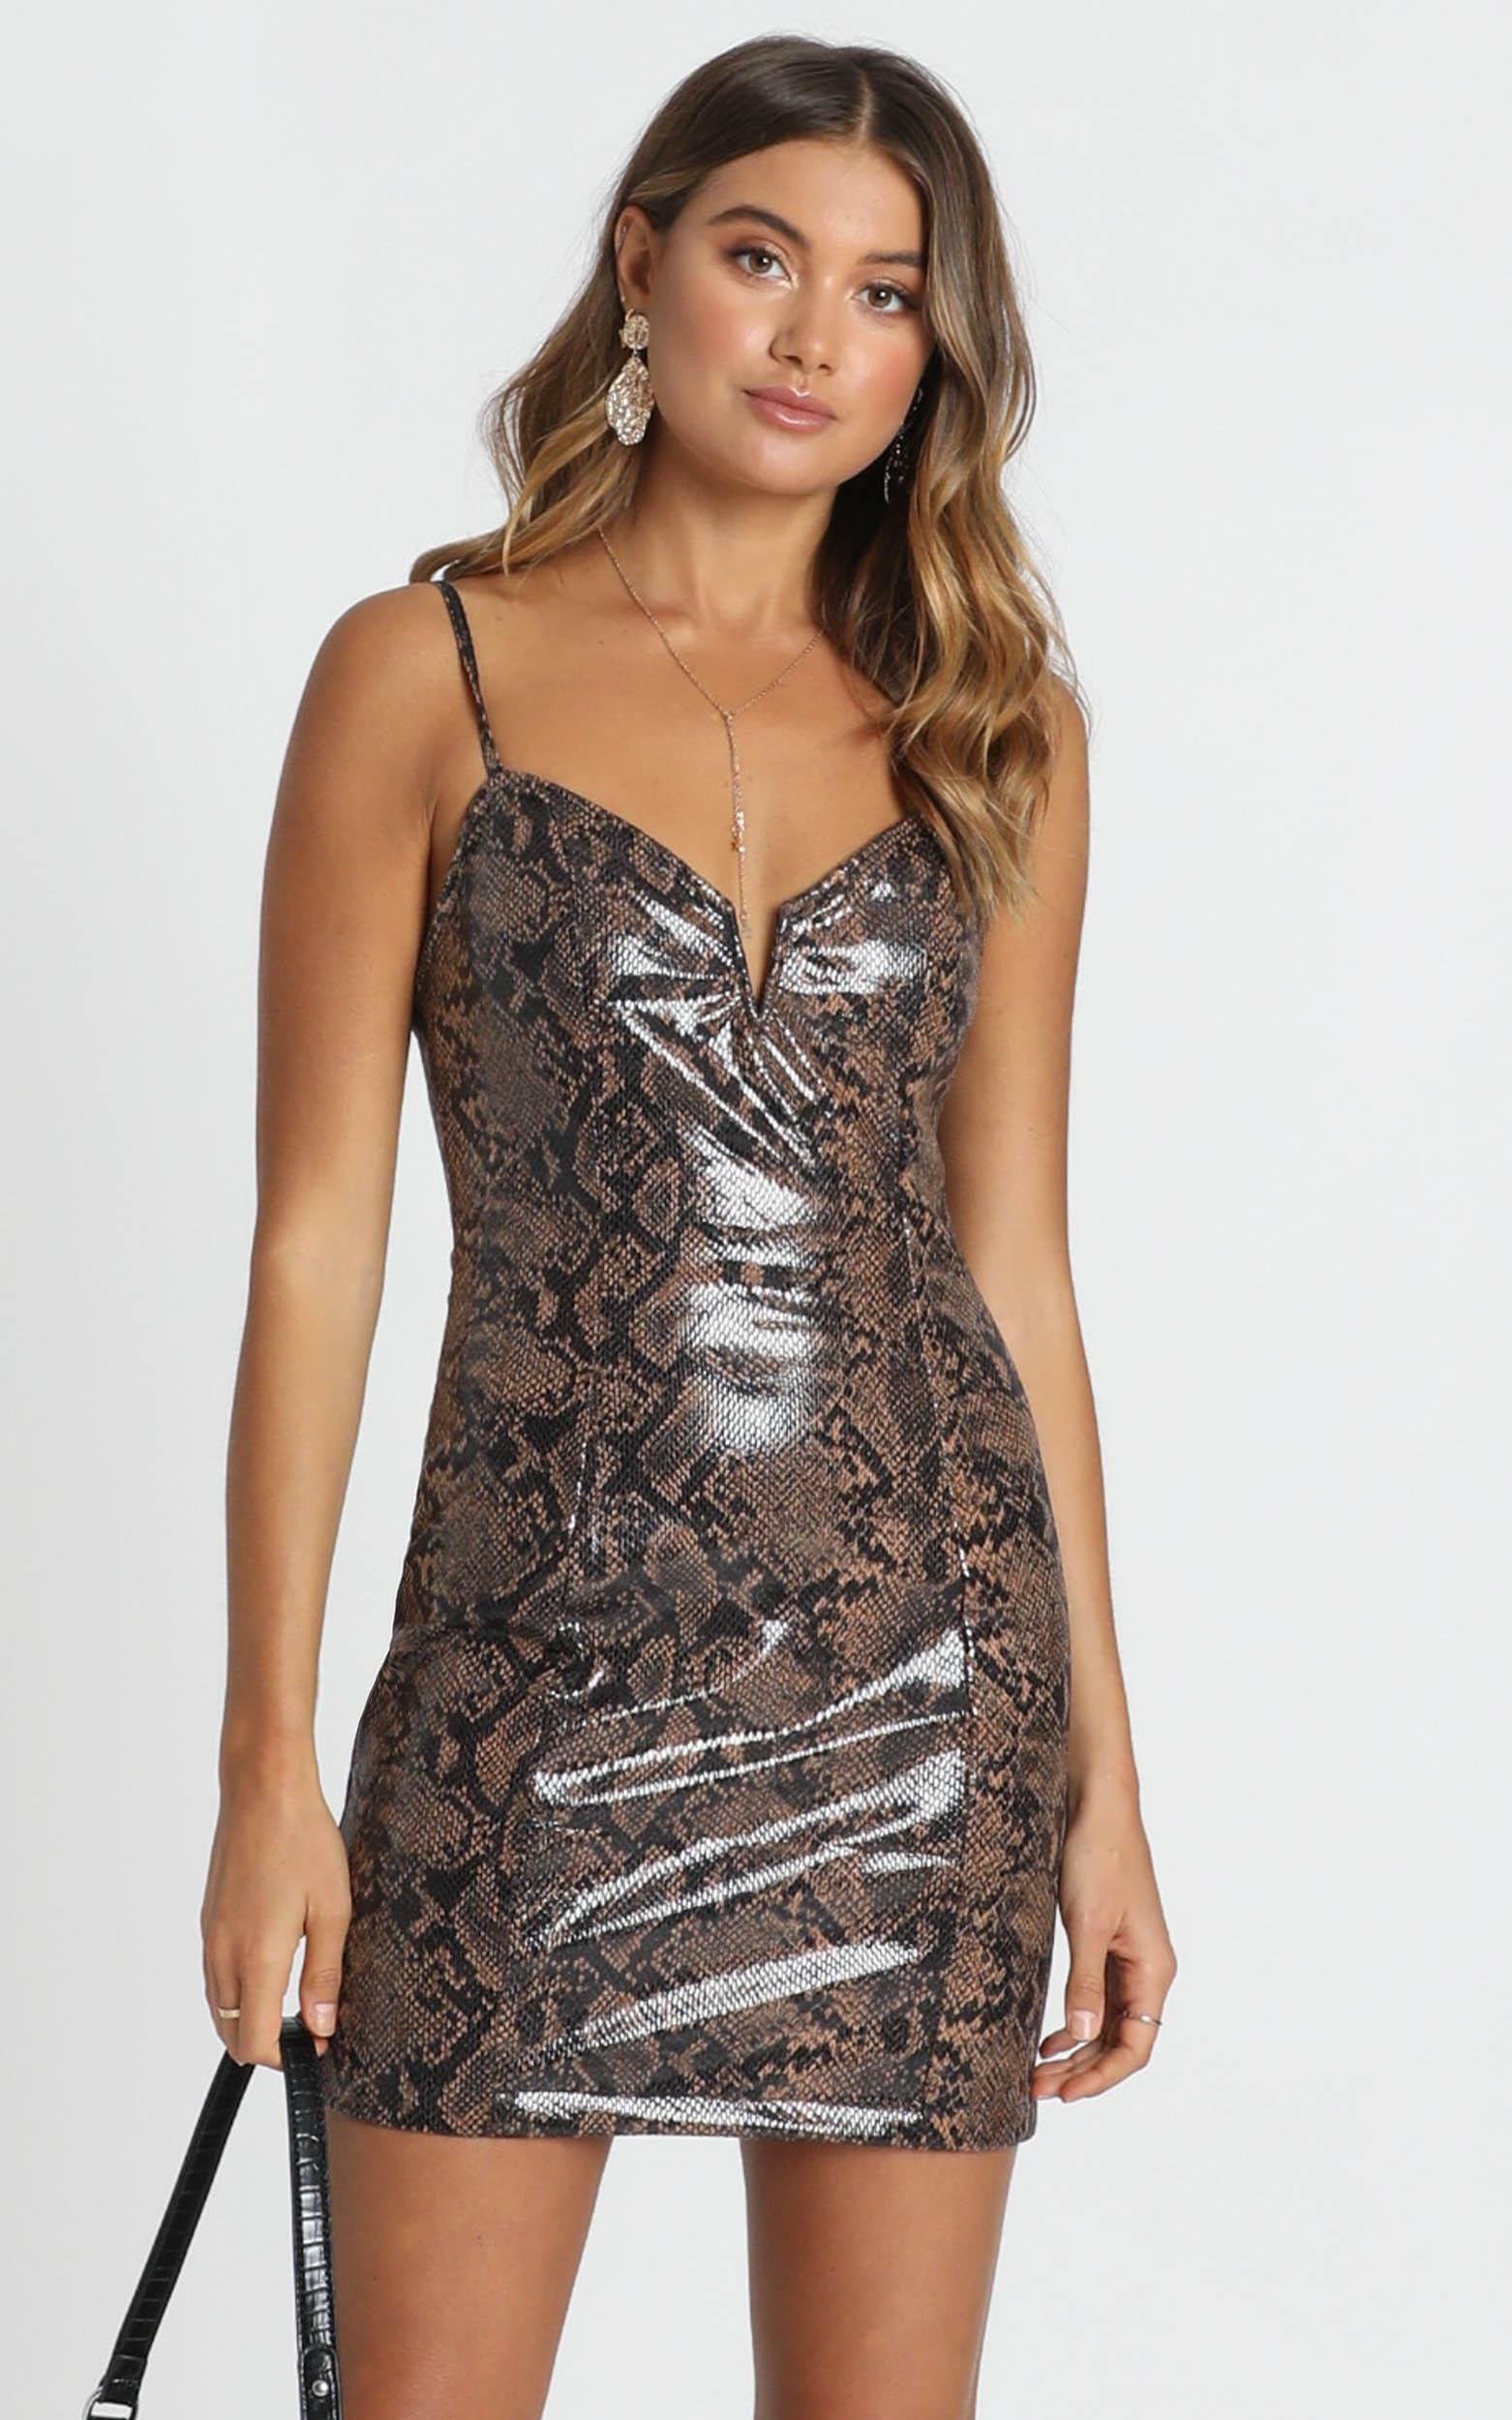 Lady Of Love Dress In Snake Print - 12 (L), Brown, hi-res image number null